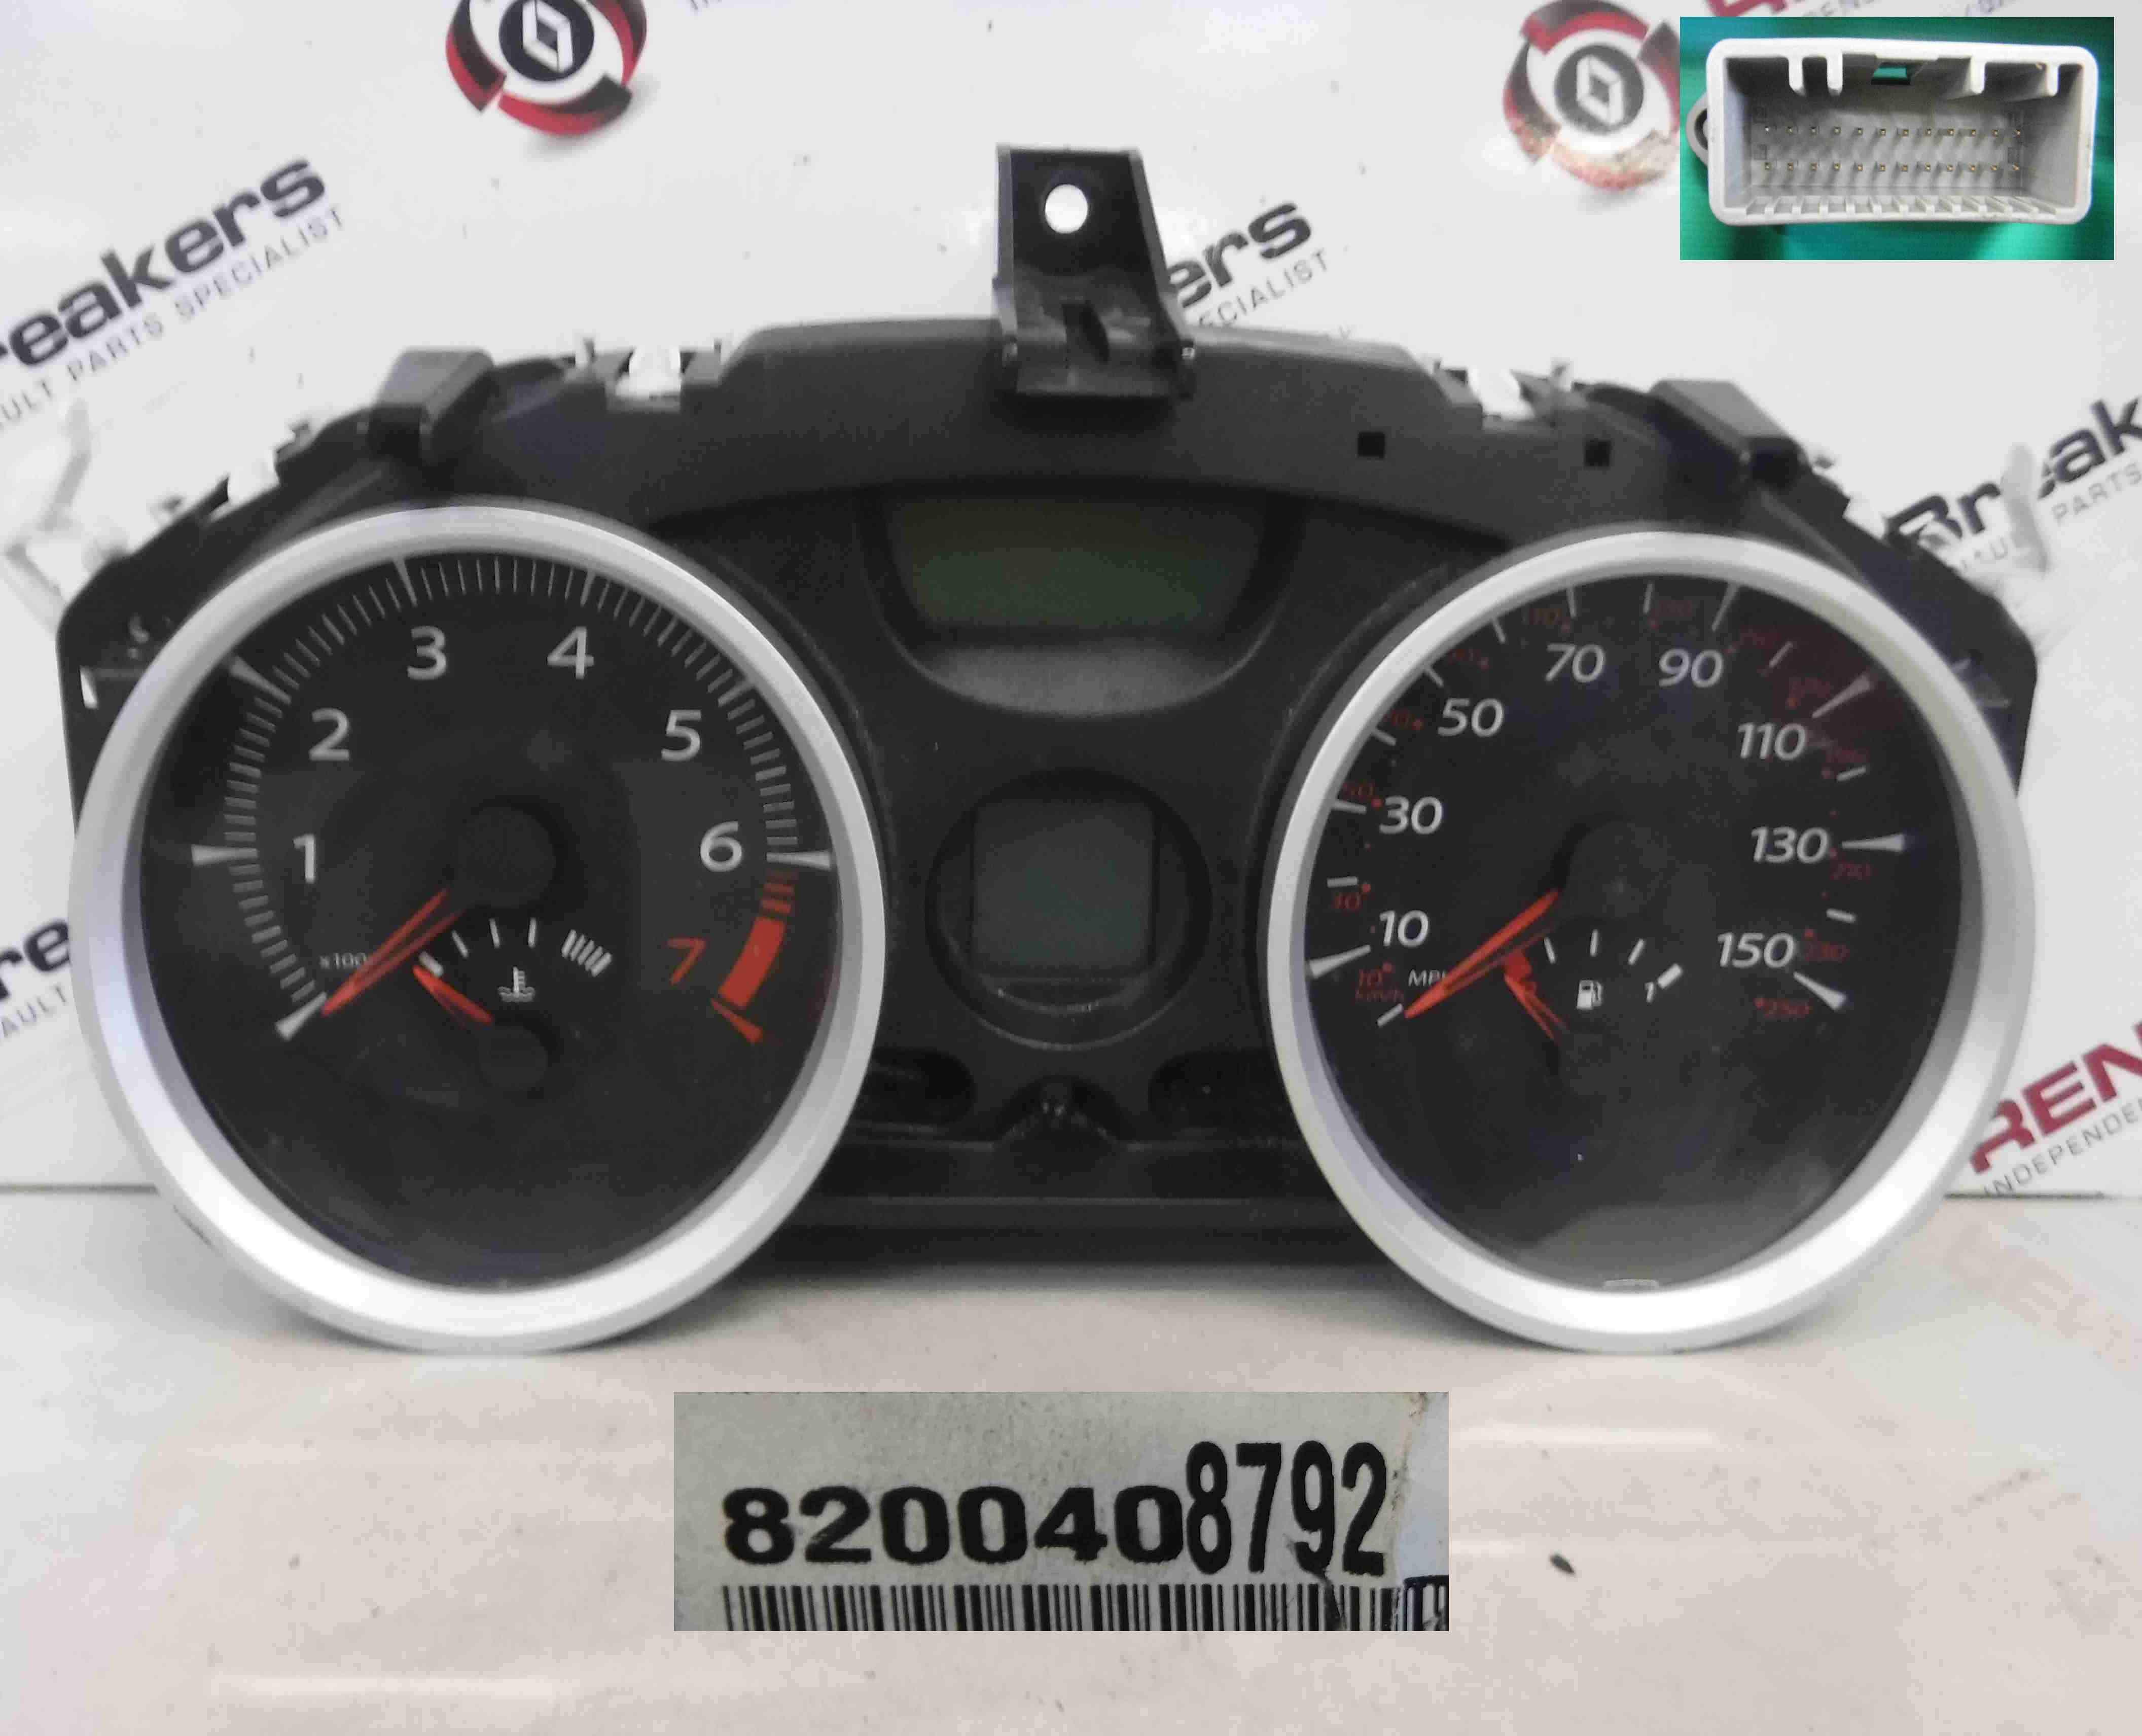 Renault Megane Convertible 2002-2008 Instrument Panel Dials Gauges Clocks 73K